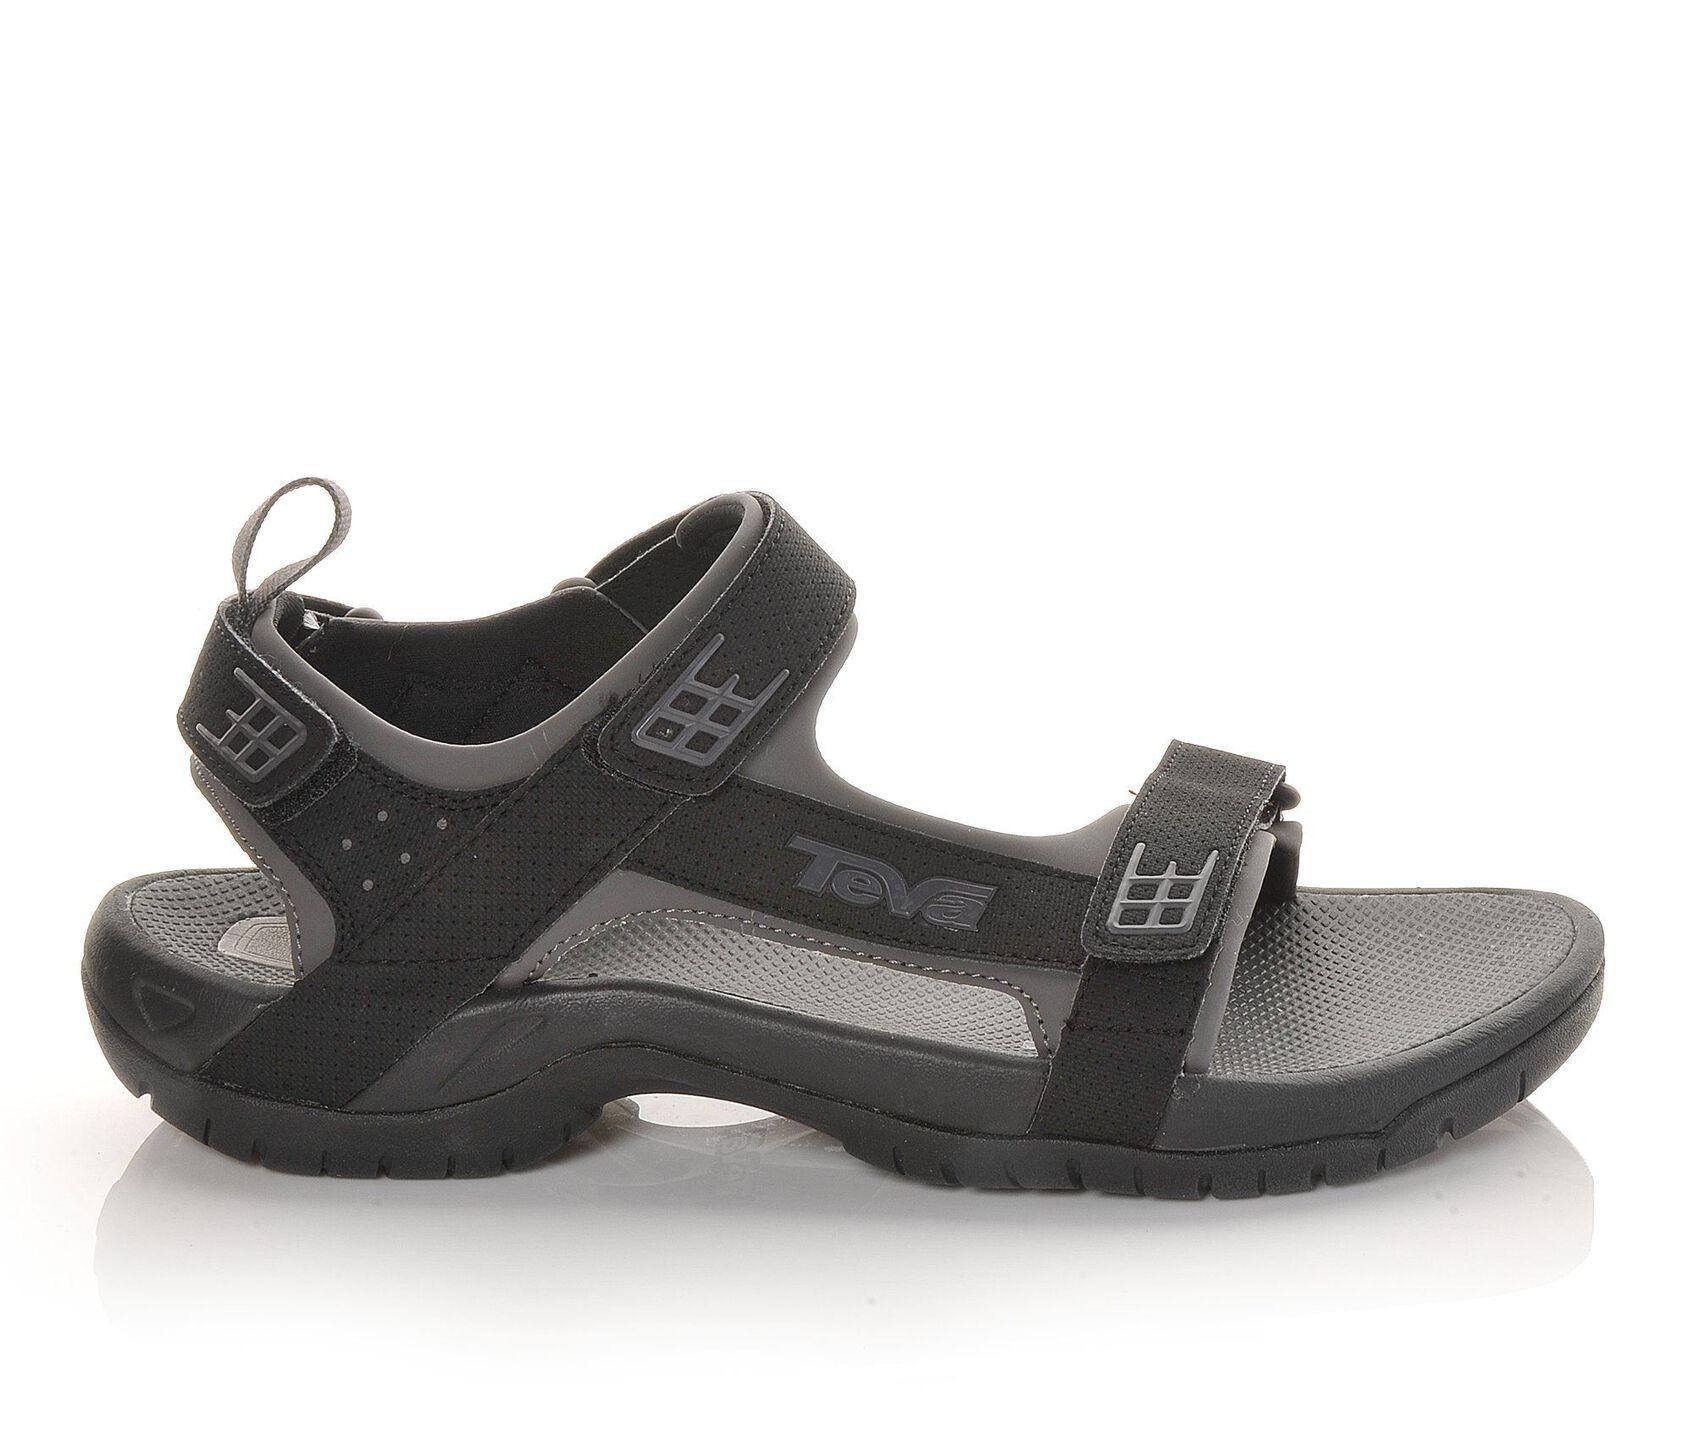 4540dc5d4 Men s Teva Minam Hiking Sandals